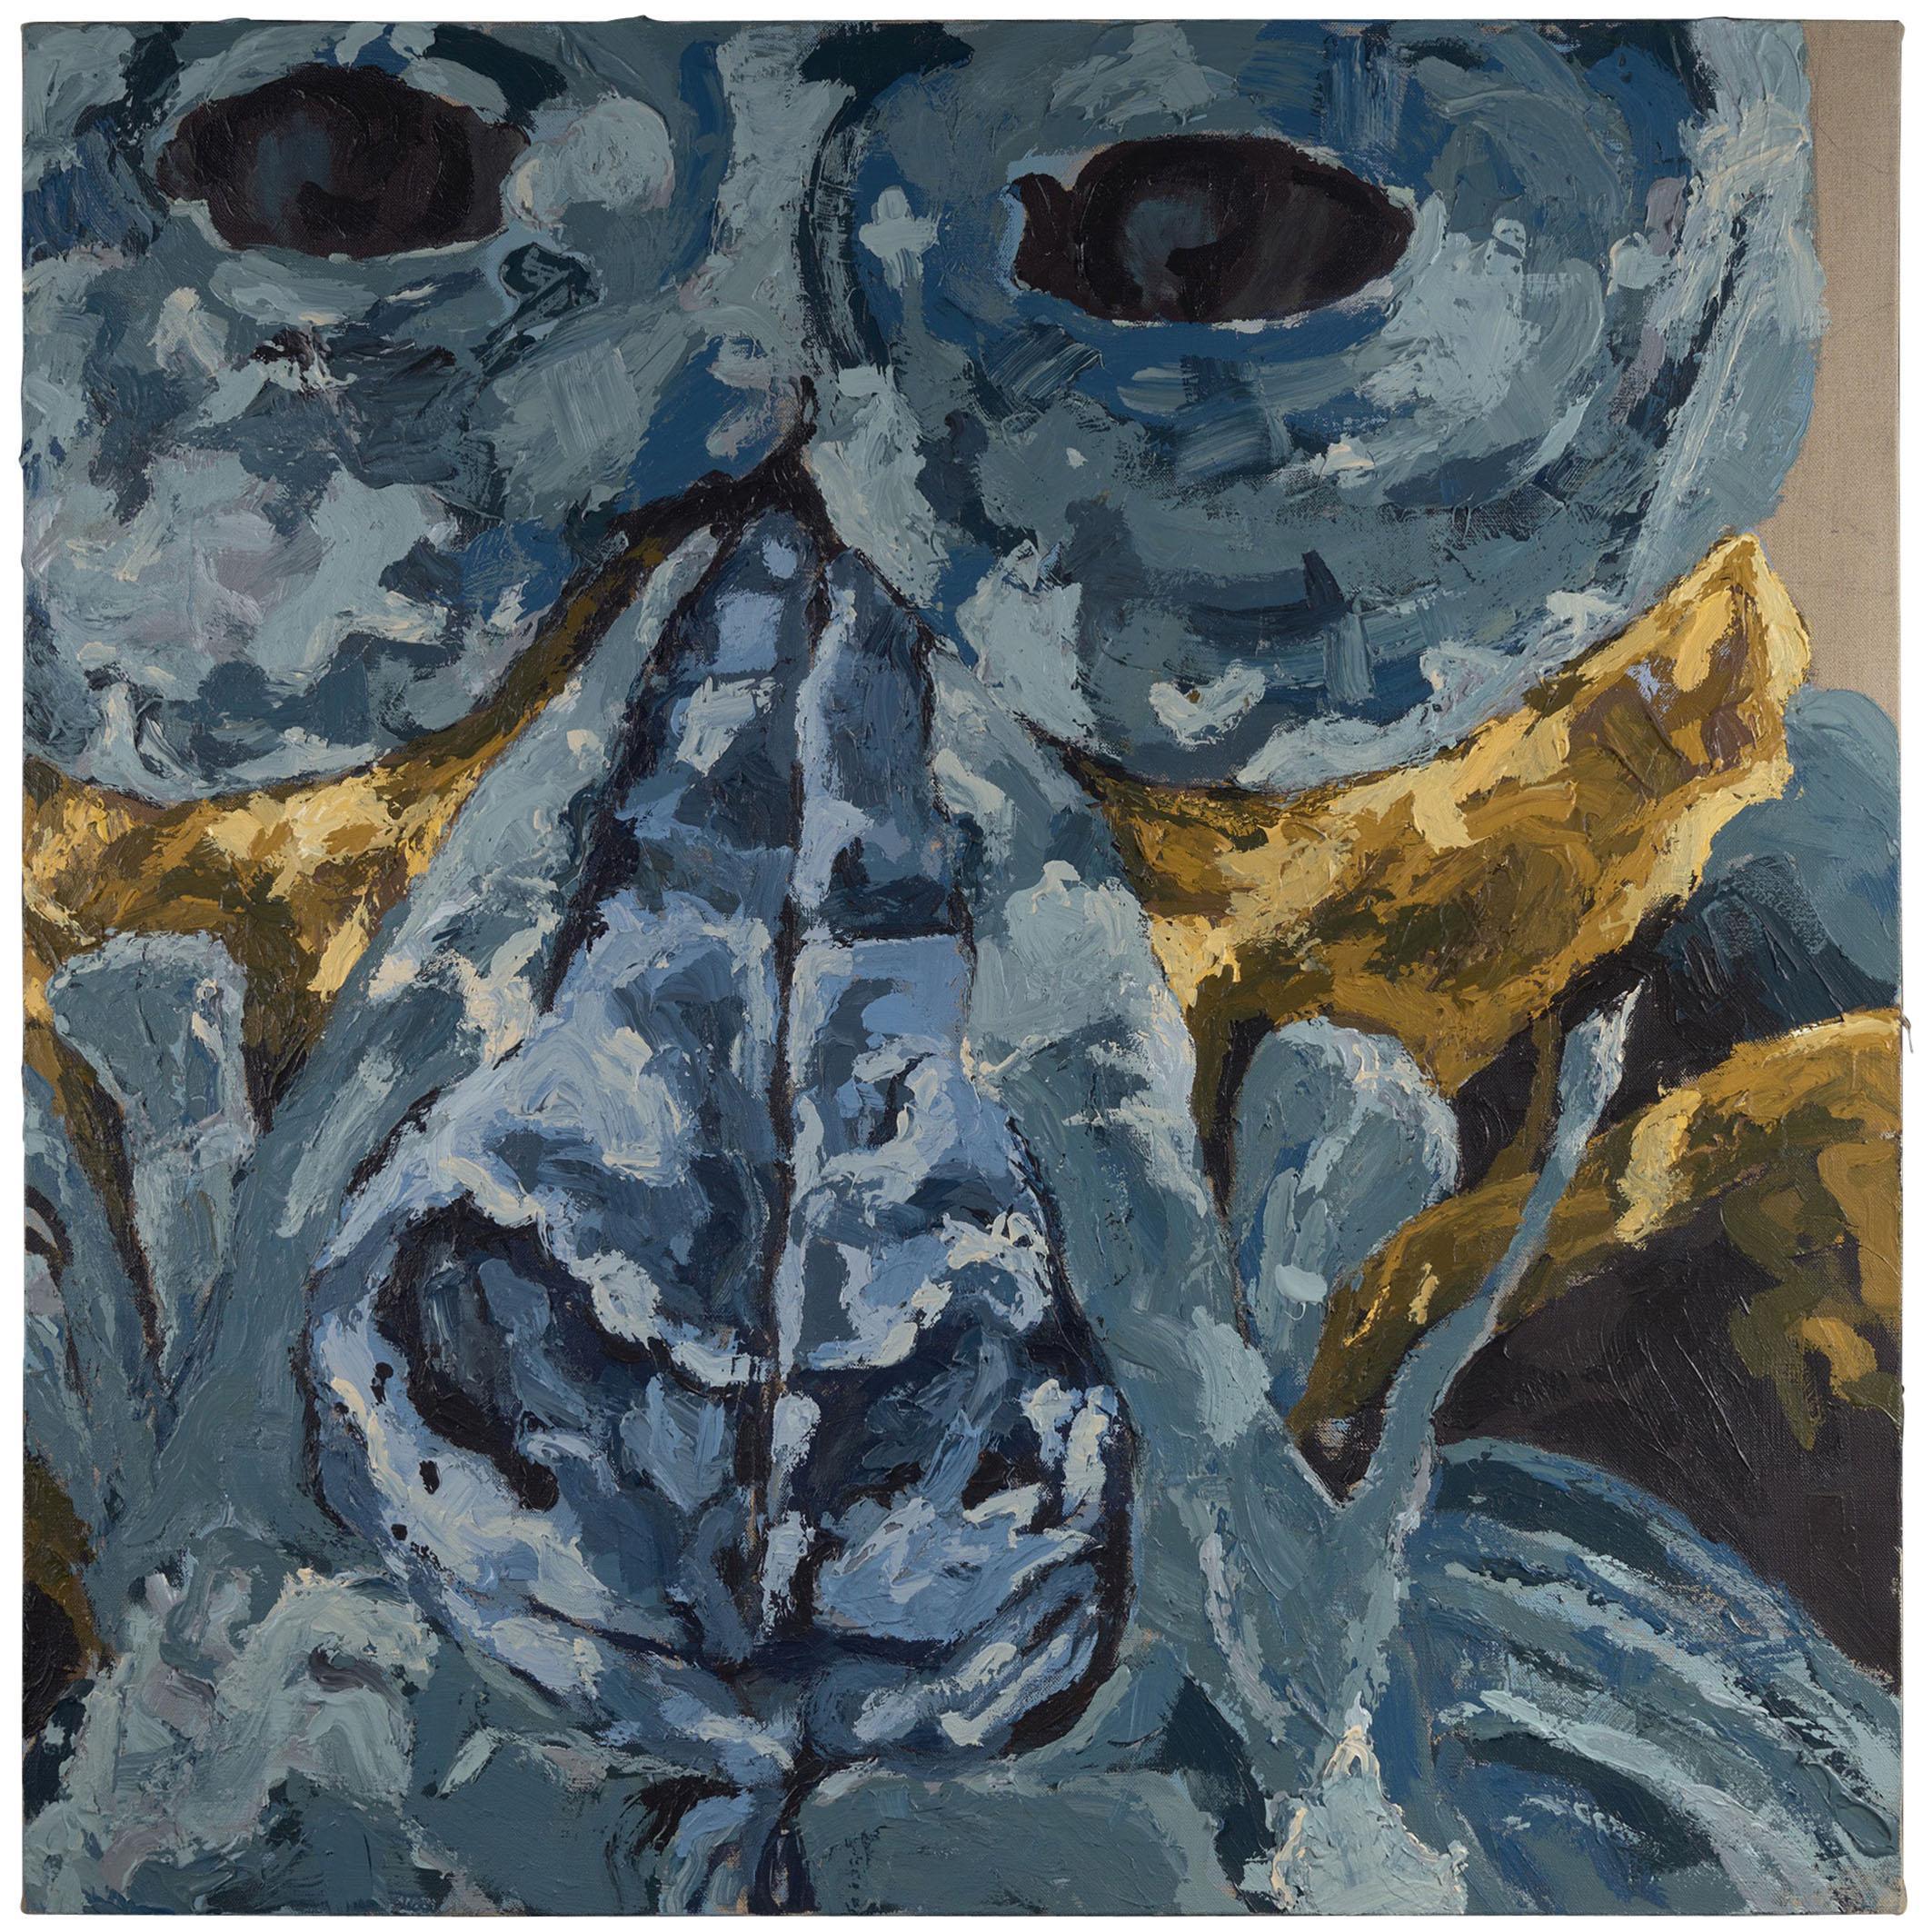 Dominique Yee, Auzoux's Troglodytes Gorilla's, Oil on Canvas